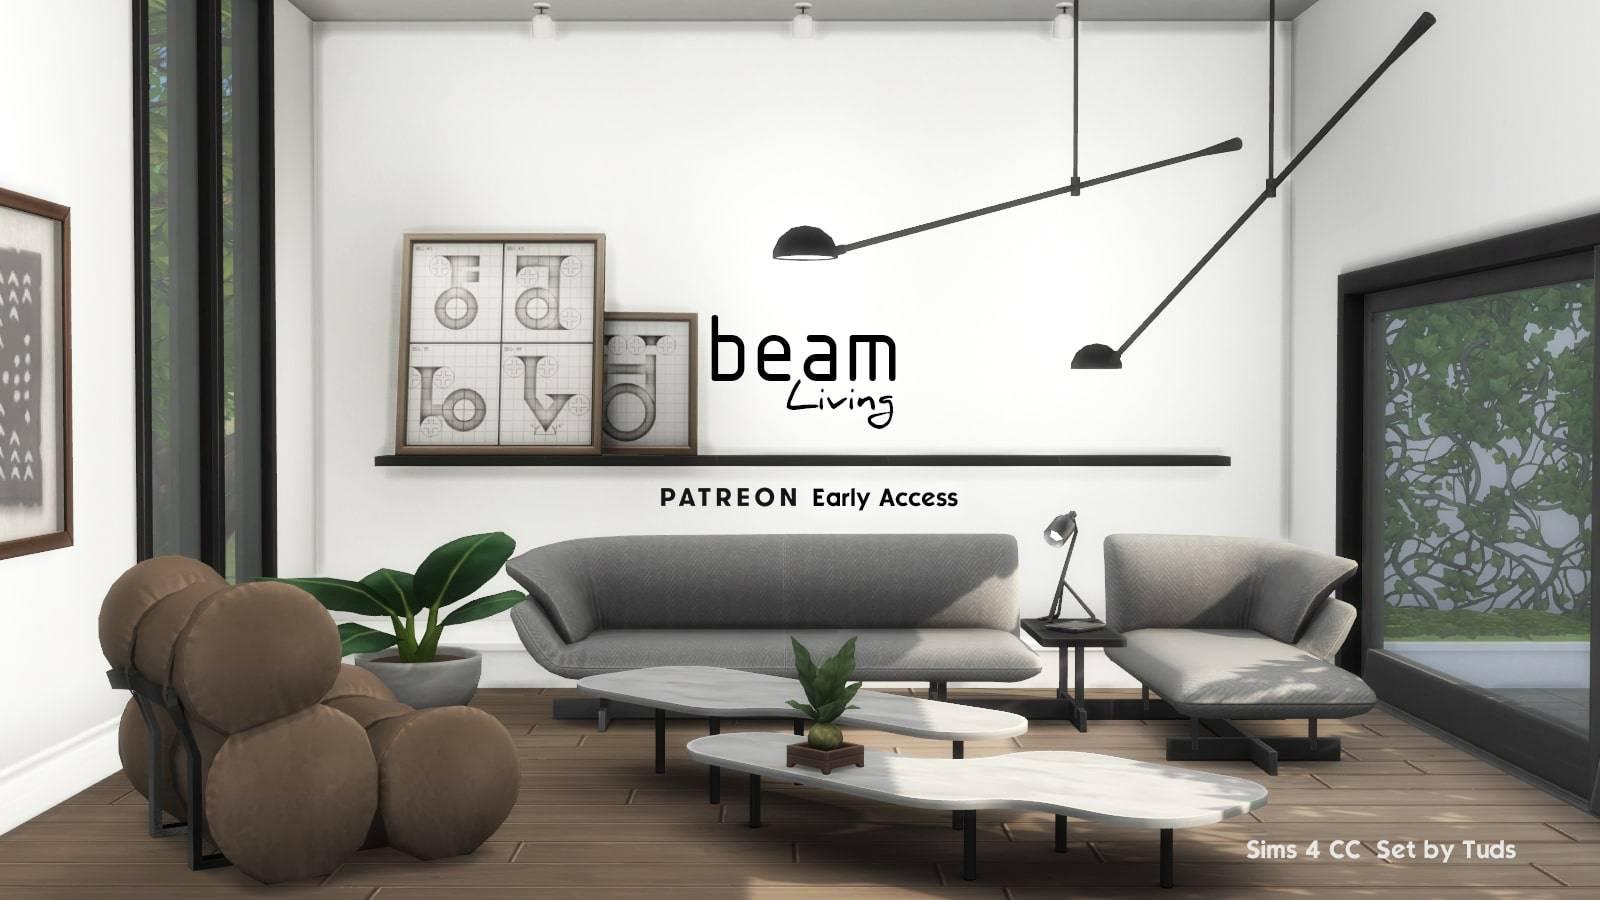 Гостиная - Beam Living Part 01